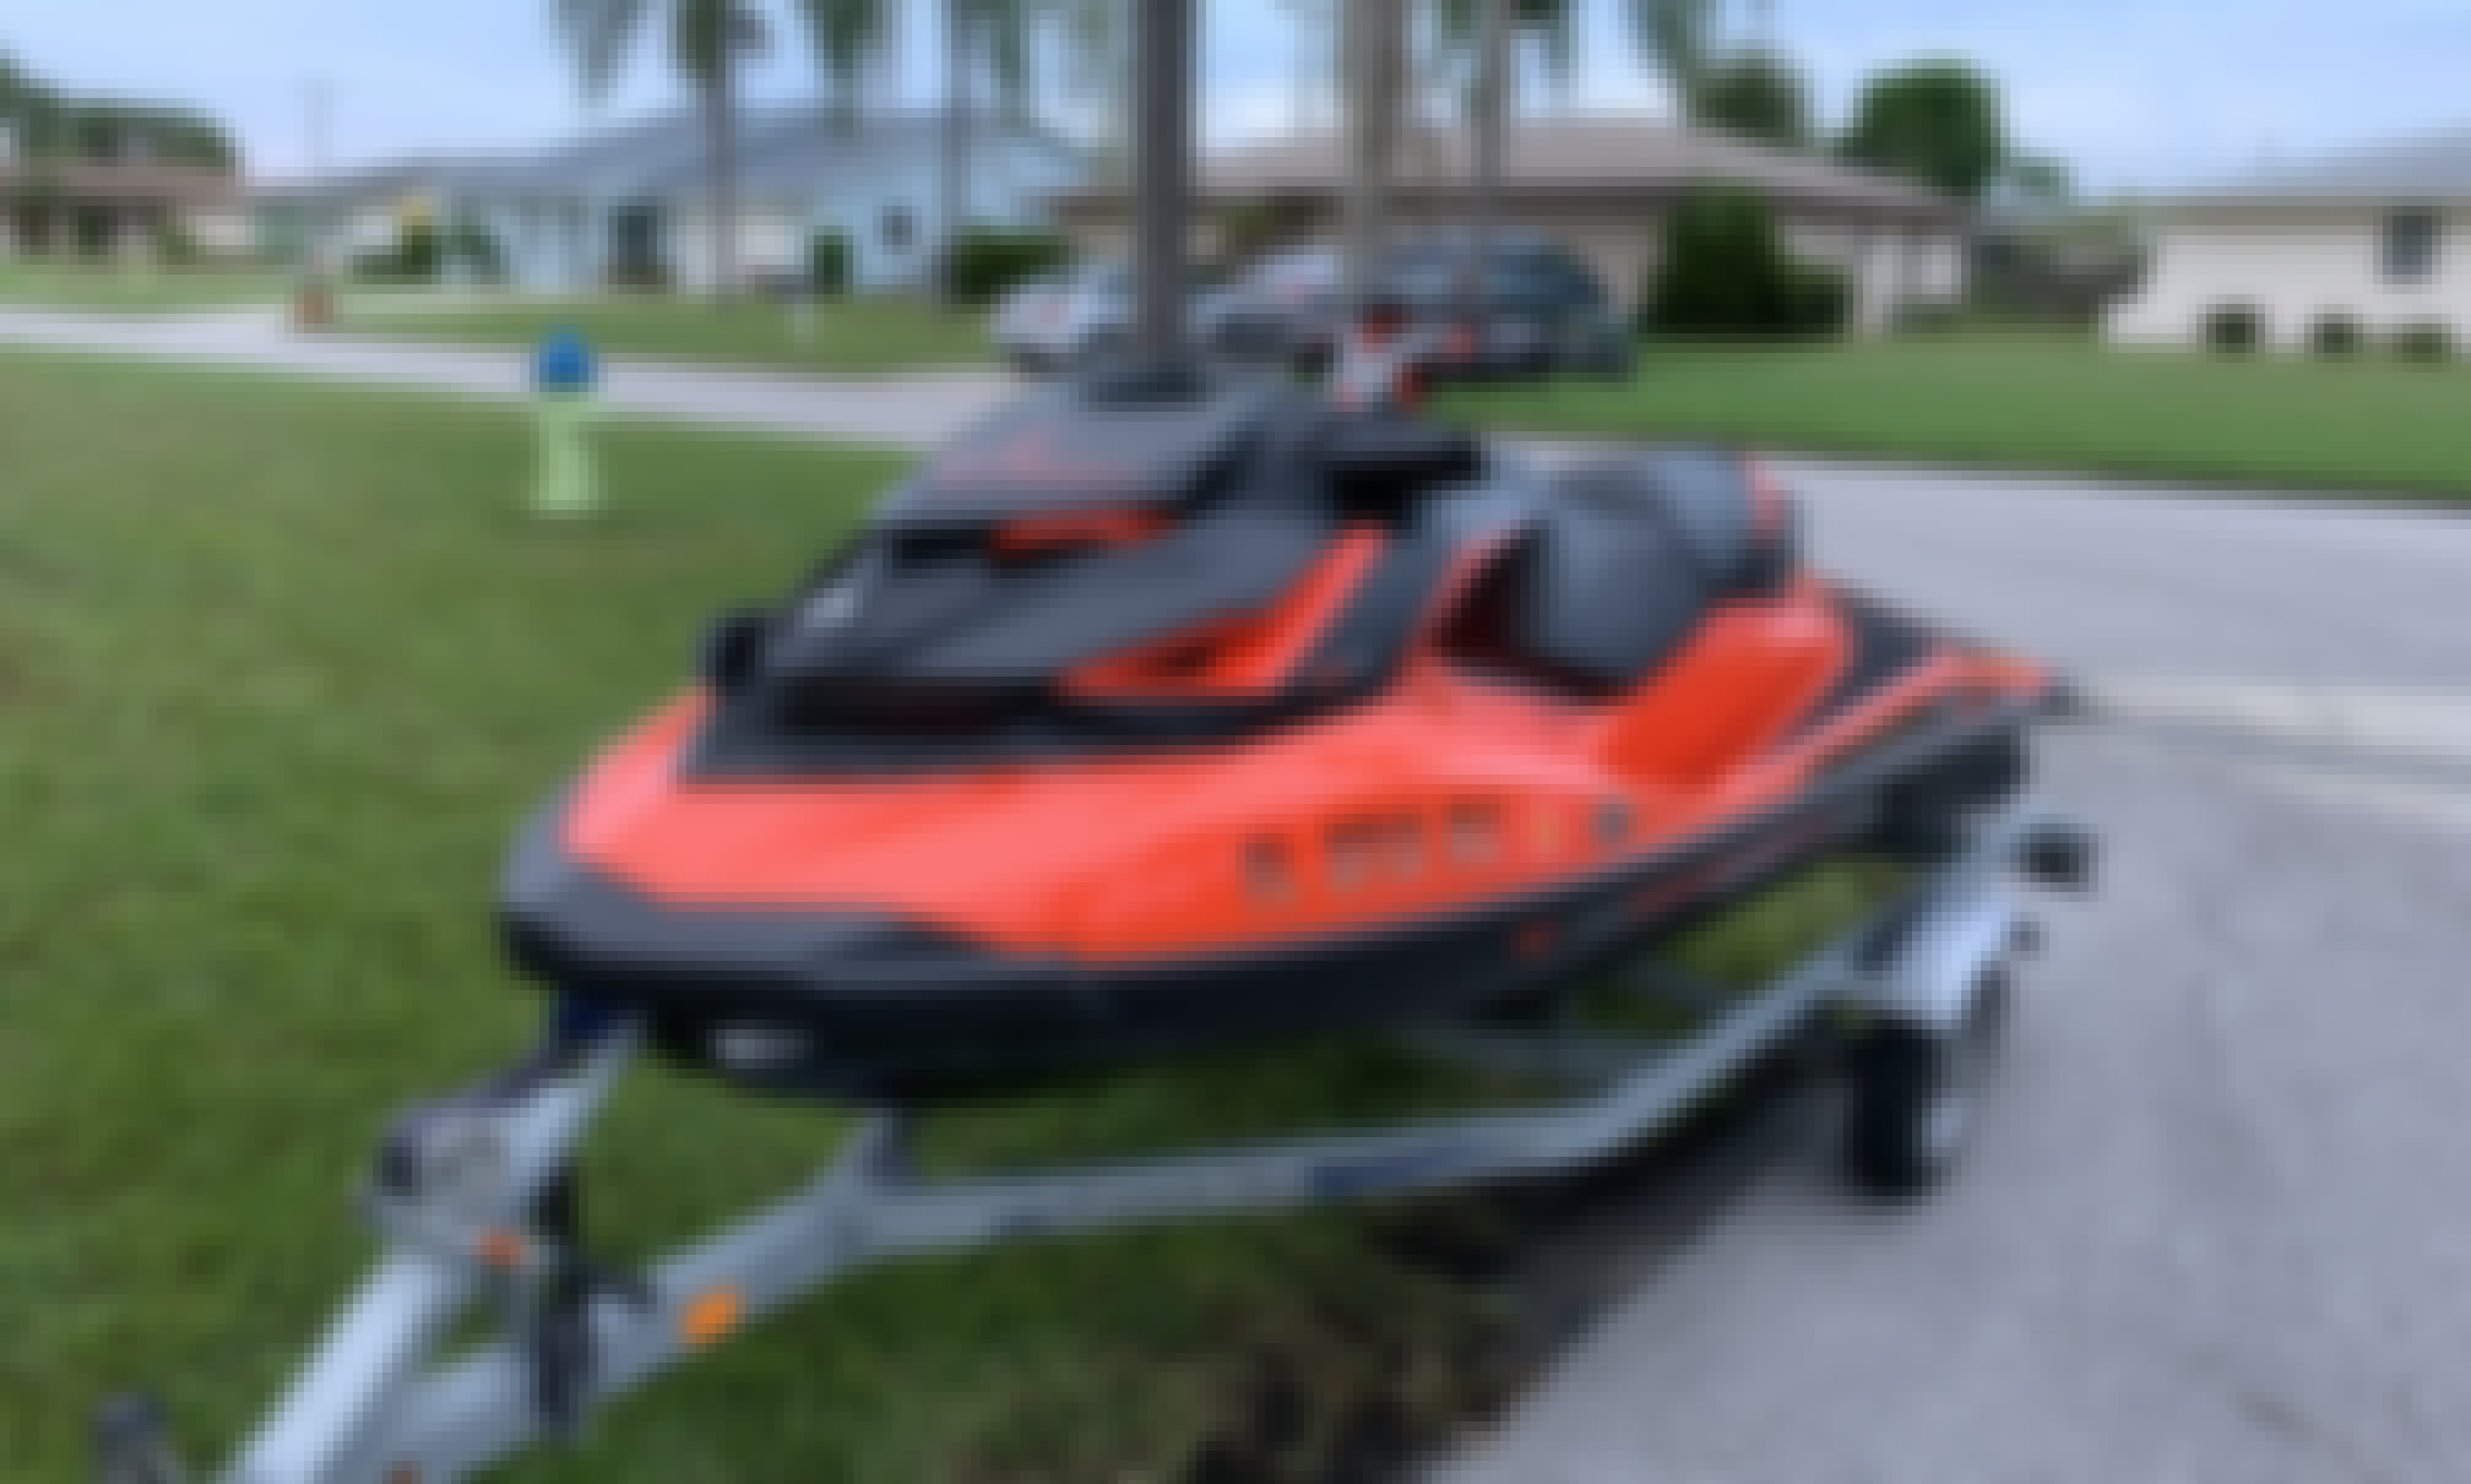 BEAST SKI'S - Seadoo RXP-X 300 and 260 in Sarasota